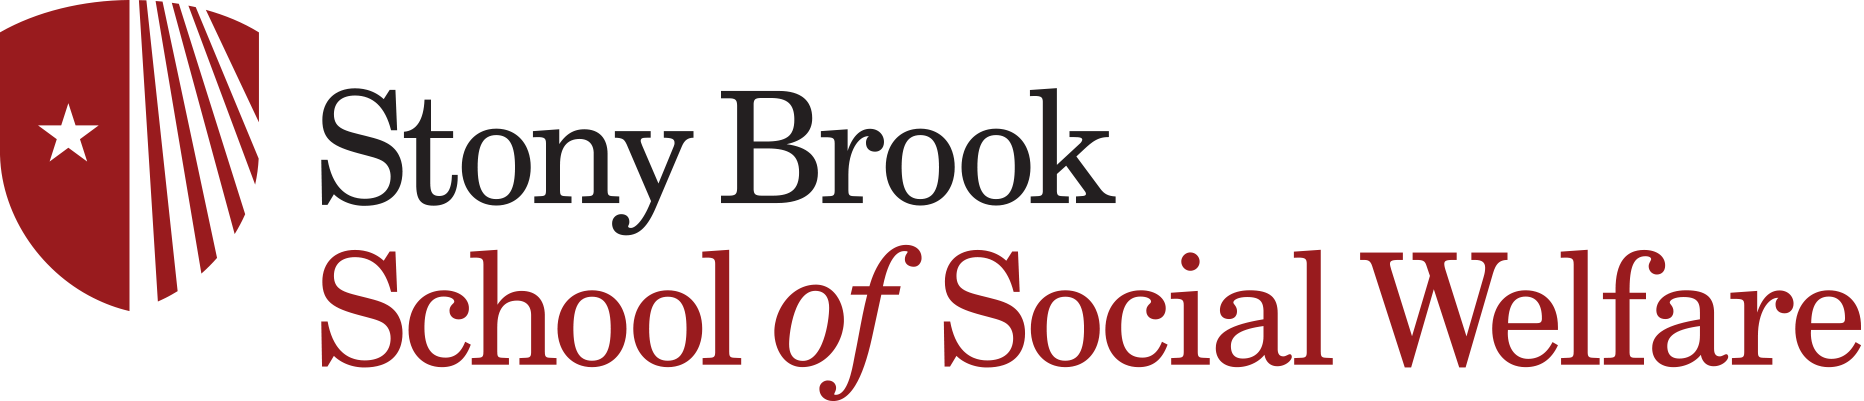 Stony Brook Academic Calendar 2020 Academic Calendars | Stony Brook University School of Social Welfare